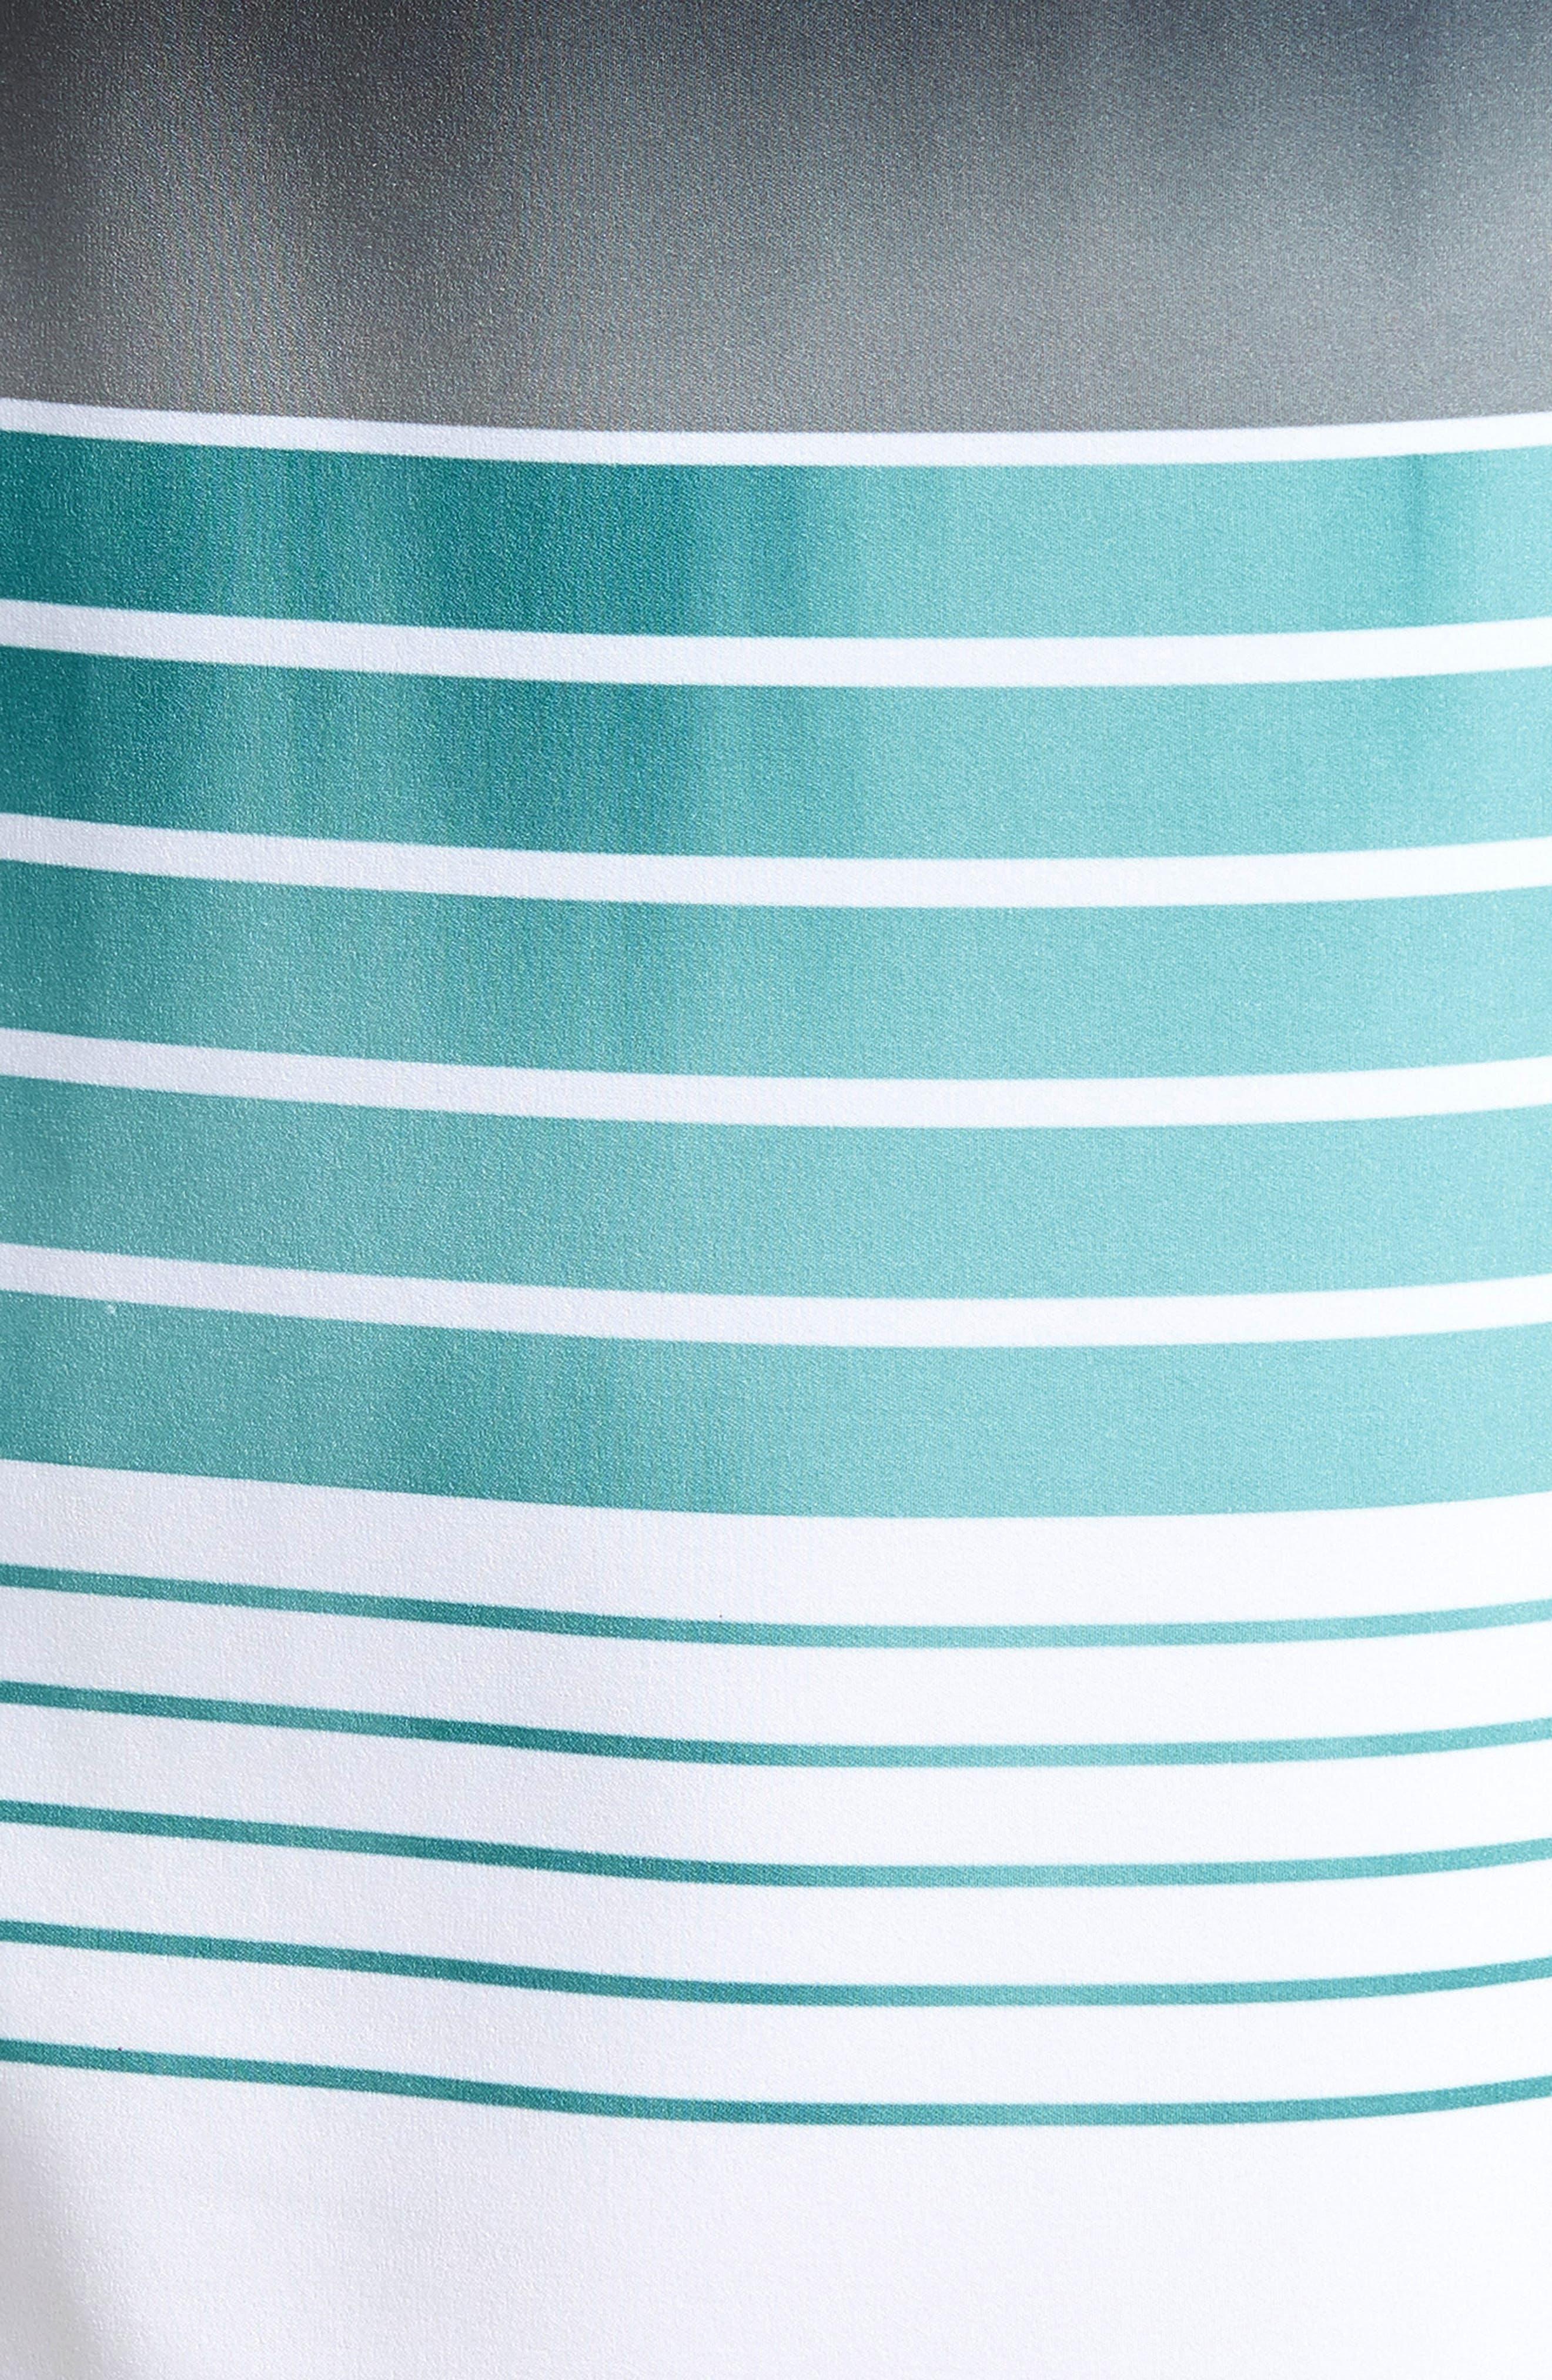 Hyperfreak Heist Board Shorts,                             Alternate thumbnail 4, color,                             Turquoise